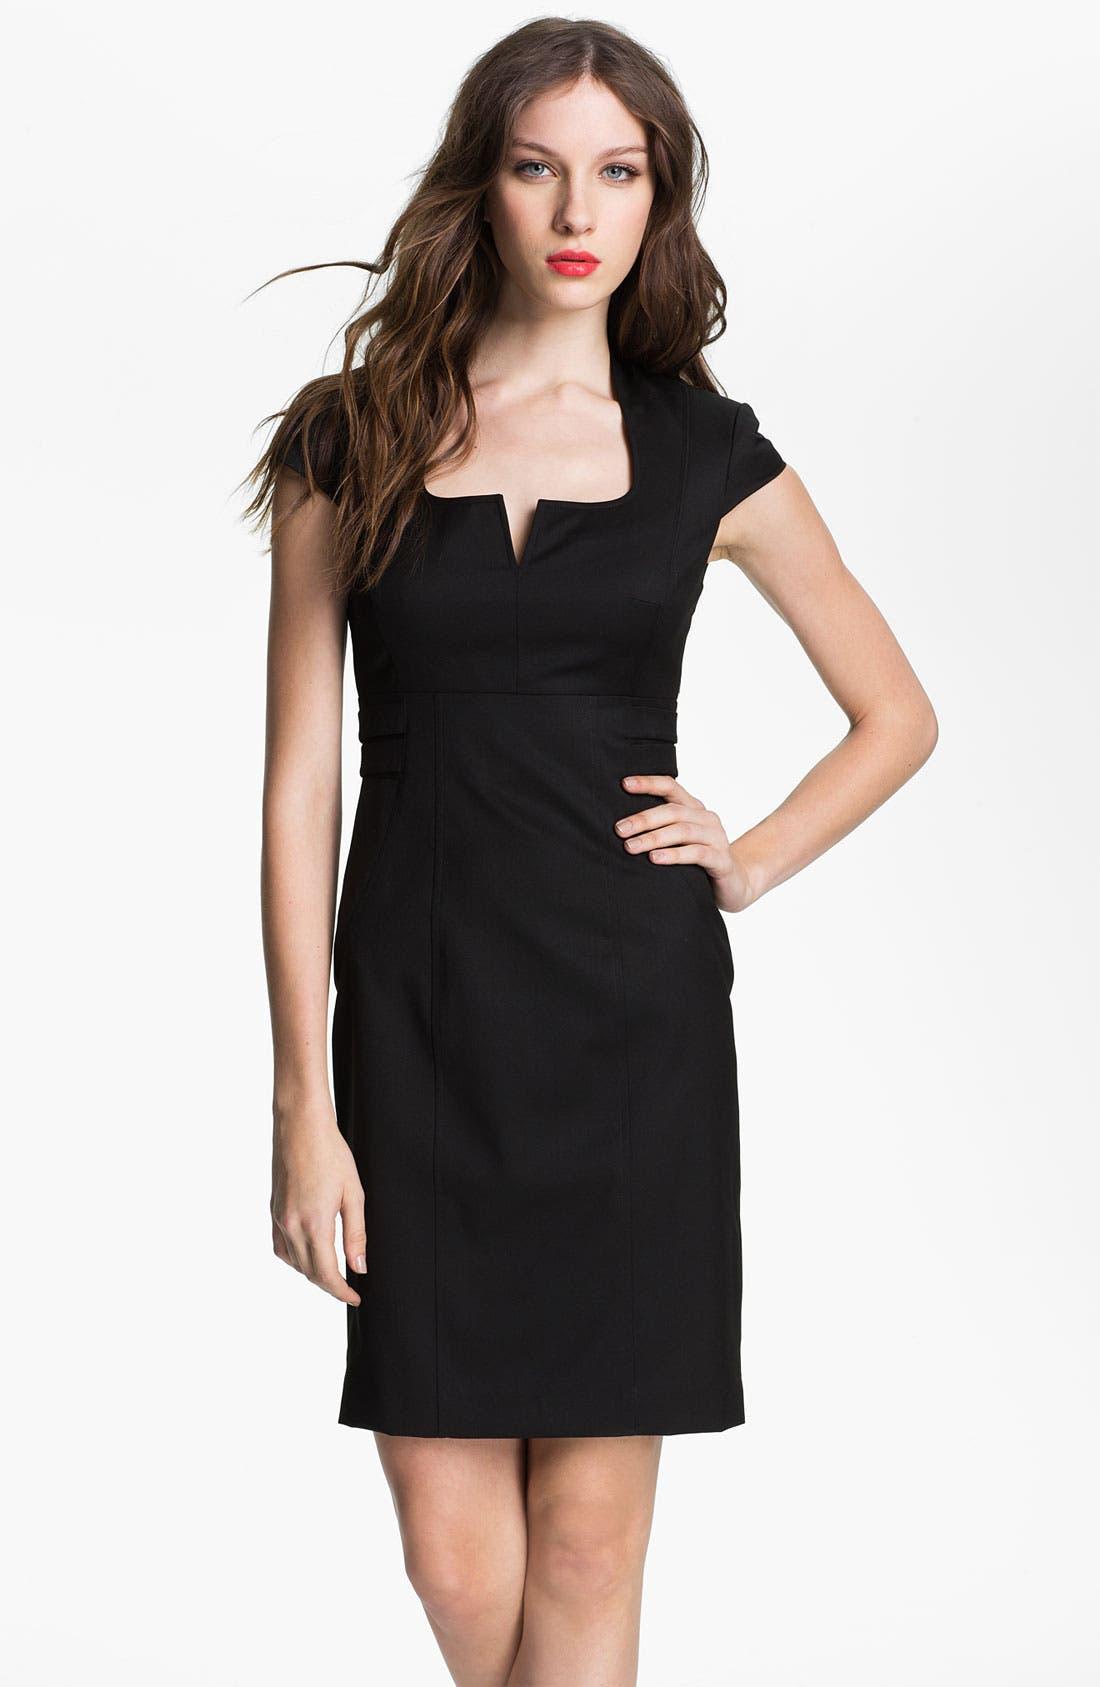 Alternate Image 1 Selected - Ted Baker London 'Agned' Wool Blend Sheath Dress